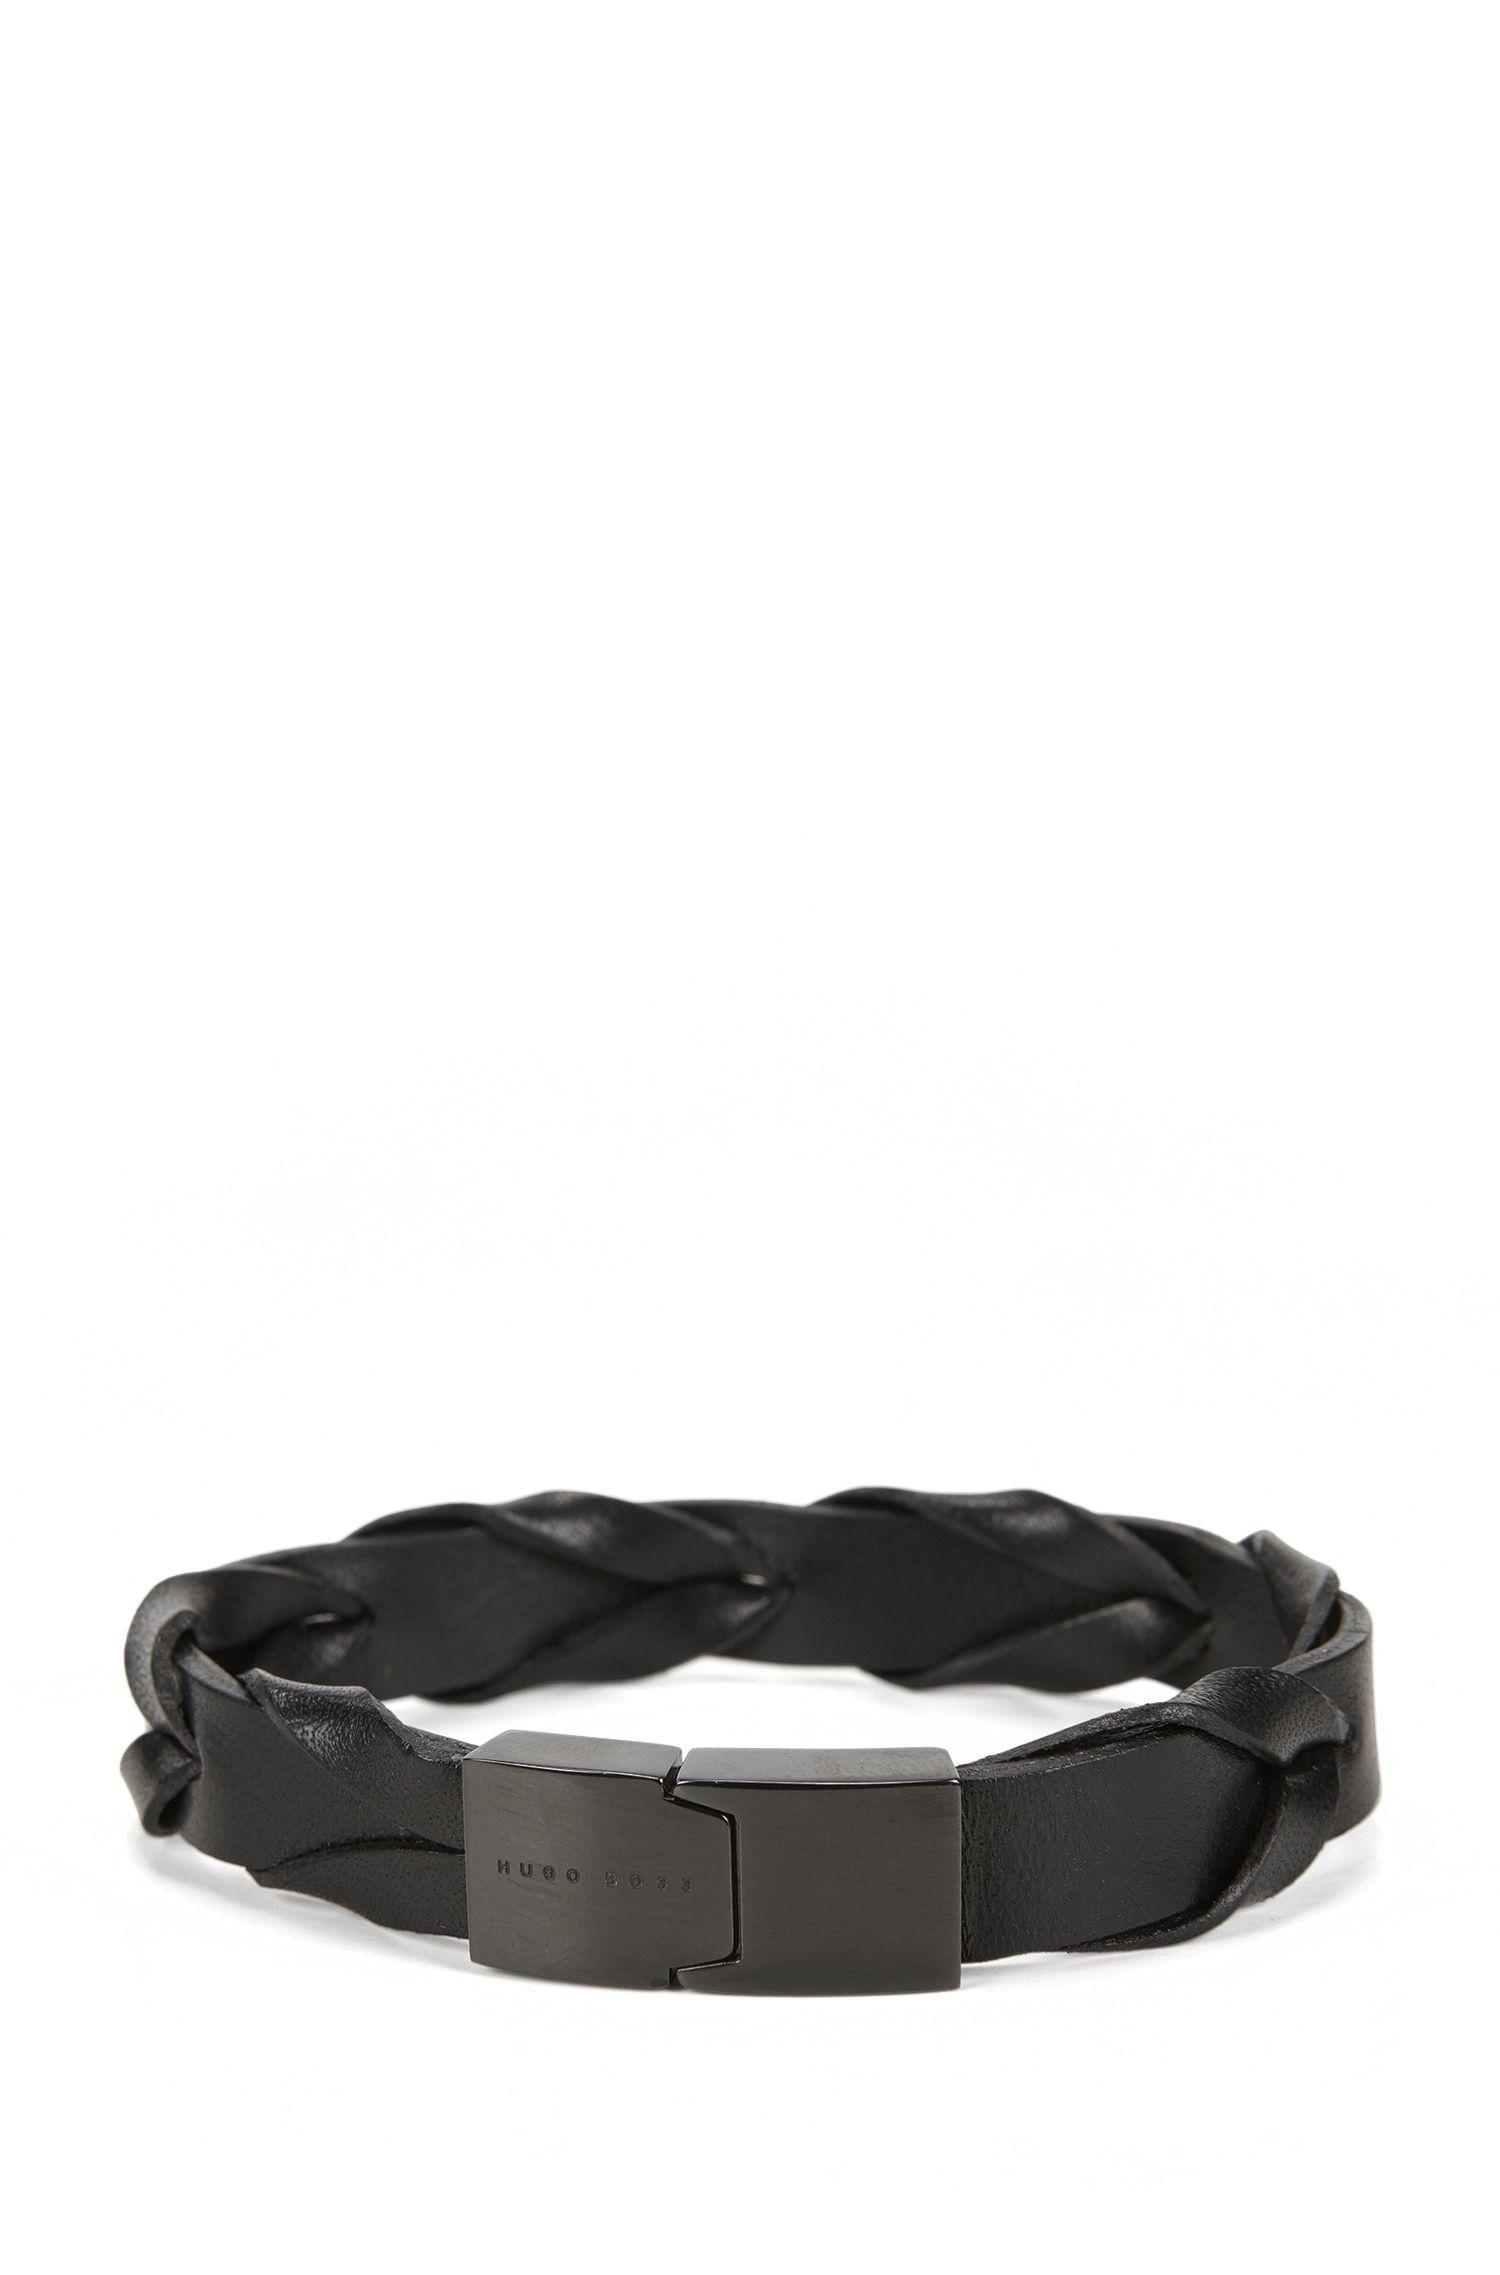 'Baldo' | Braided Leather Bracelet